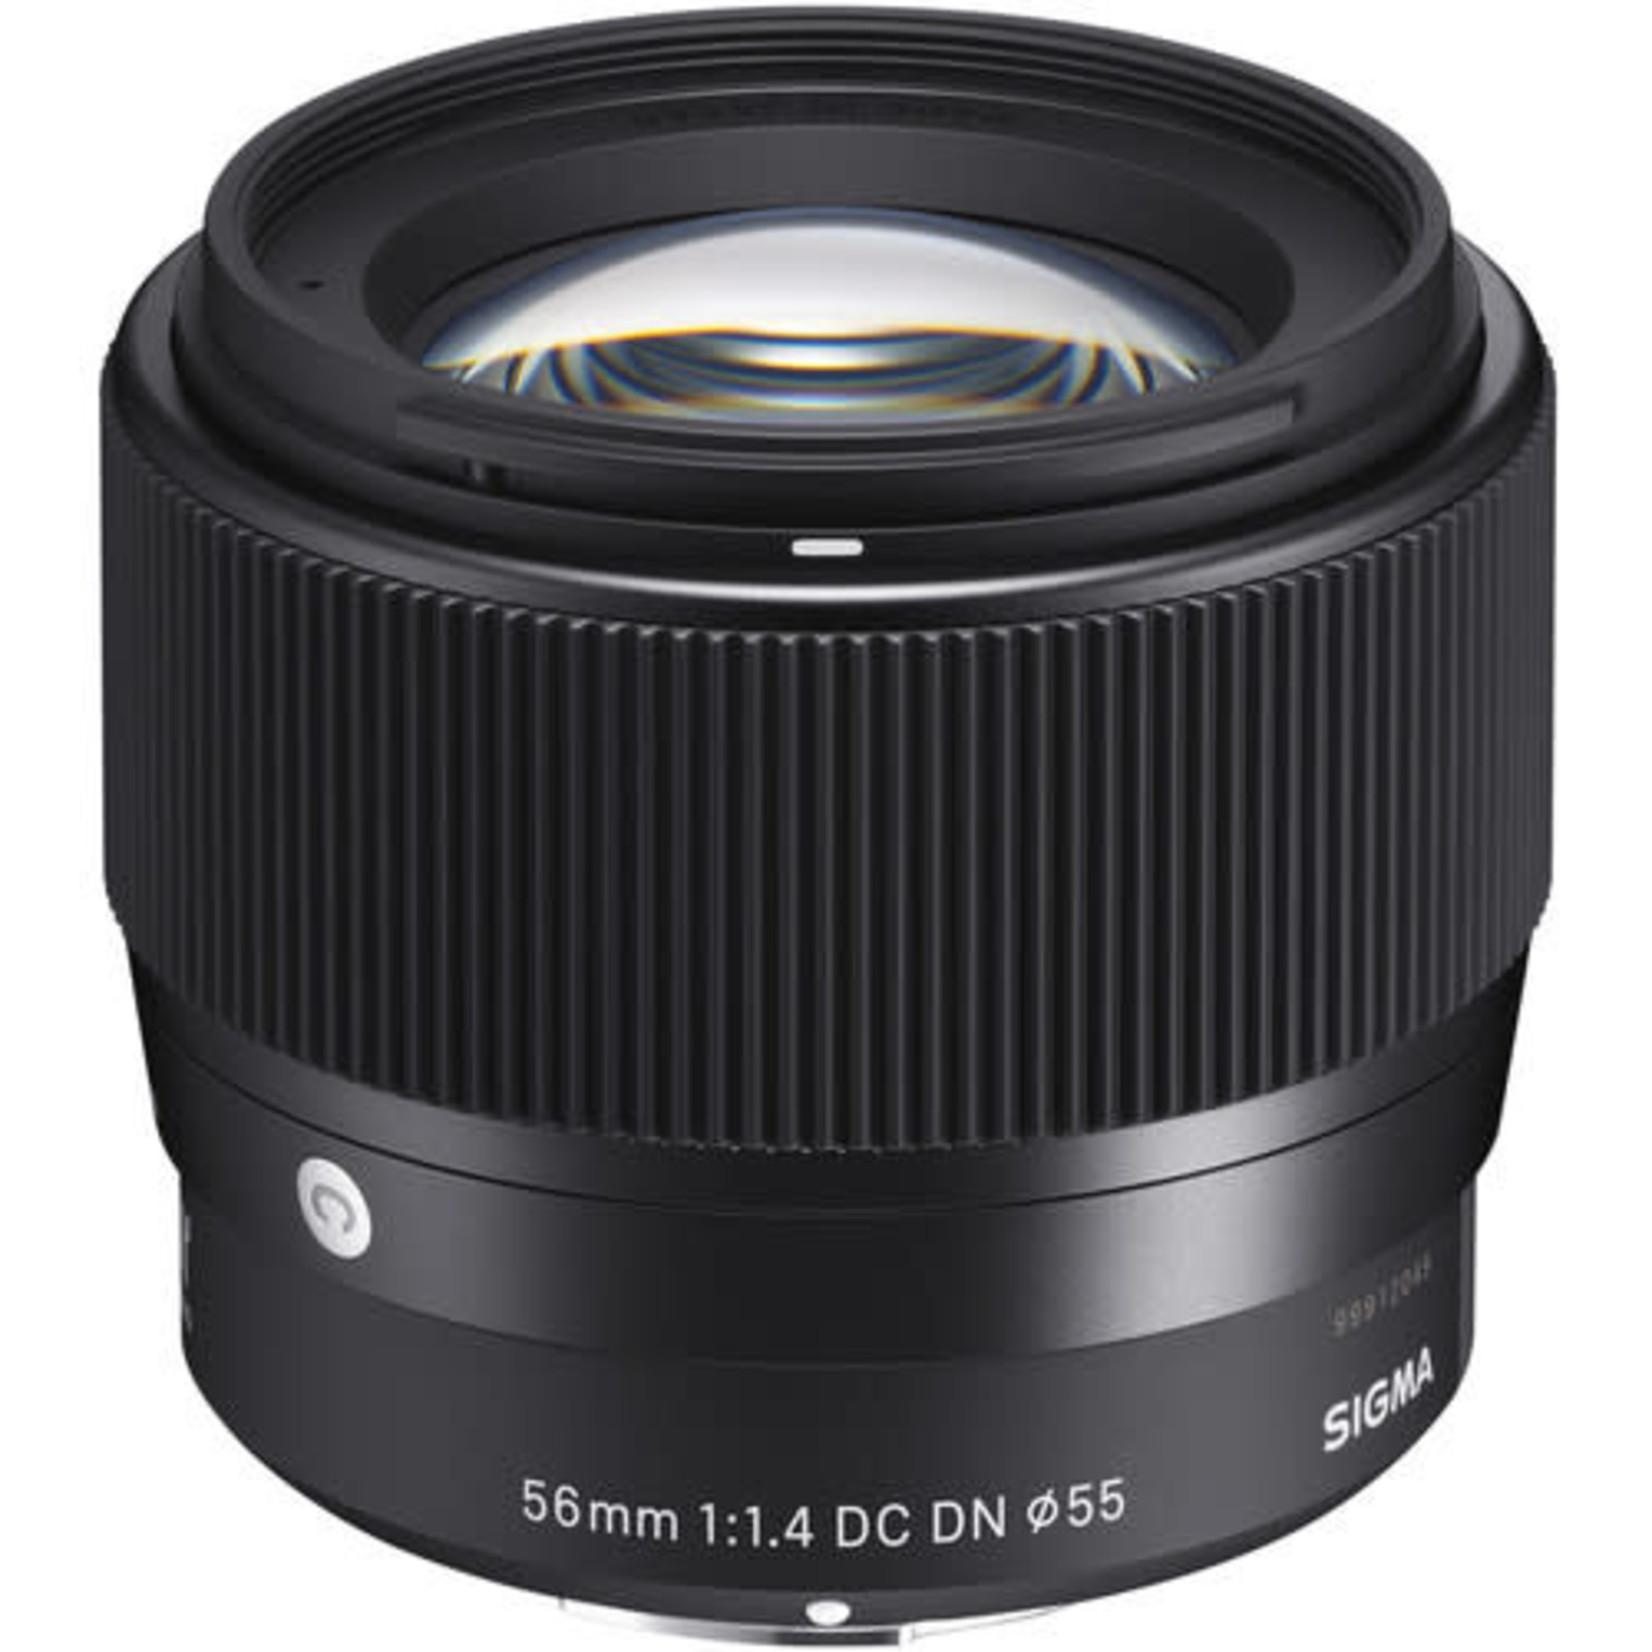 Sigma Sigma 56mm f/1.4 DC DN Contemporary Lens for Sony E